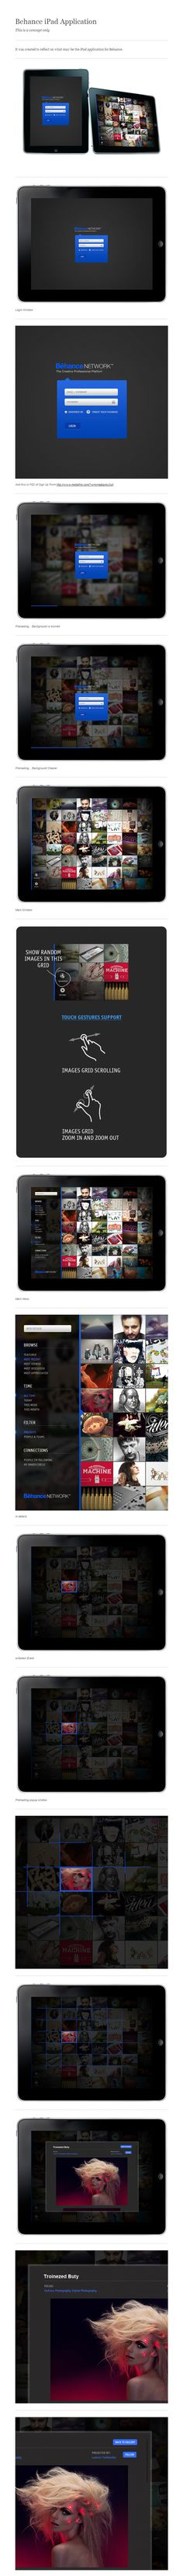 Behance iPad Application (Concept) / Vladimir Kudinov #ui #design #user #iterface #ios